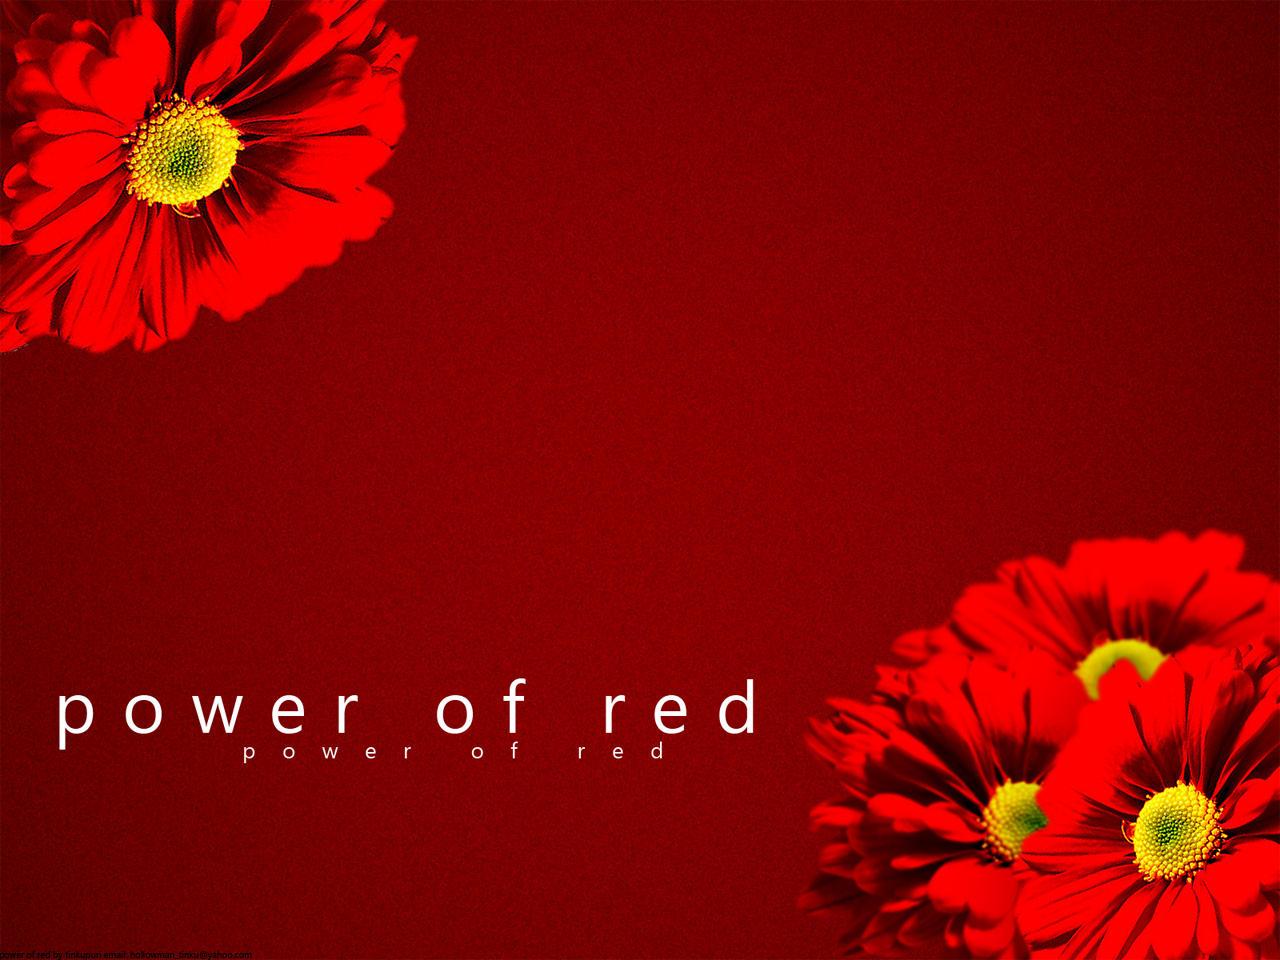 POWER OF RED by tinkupuri